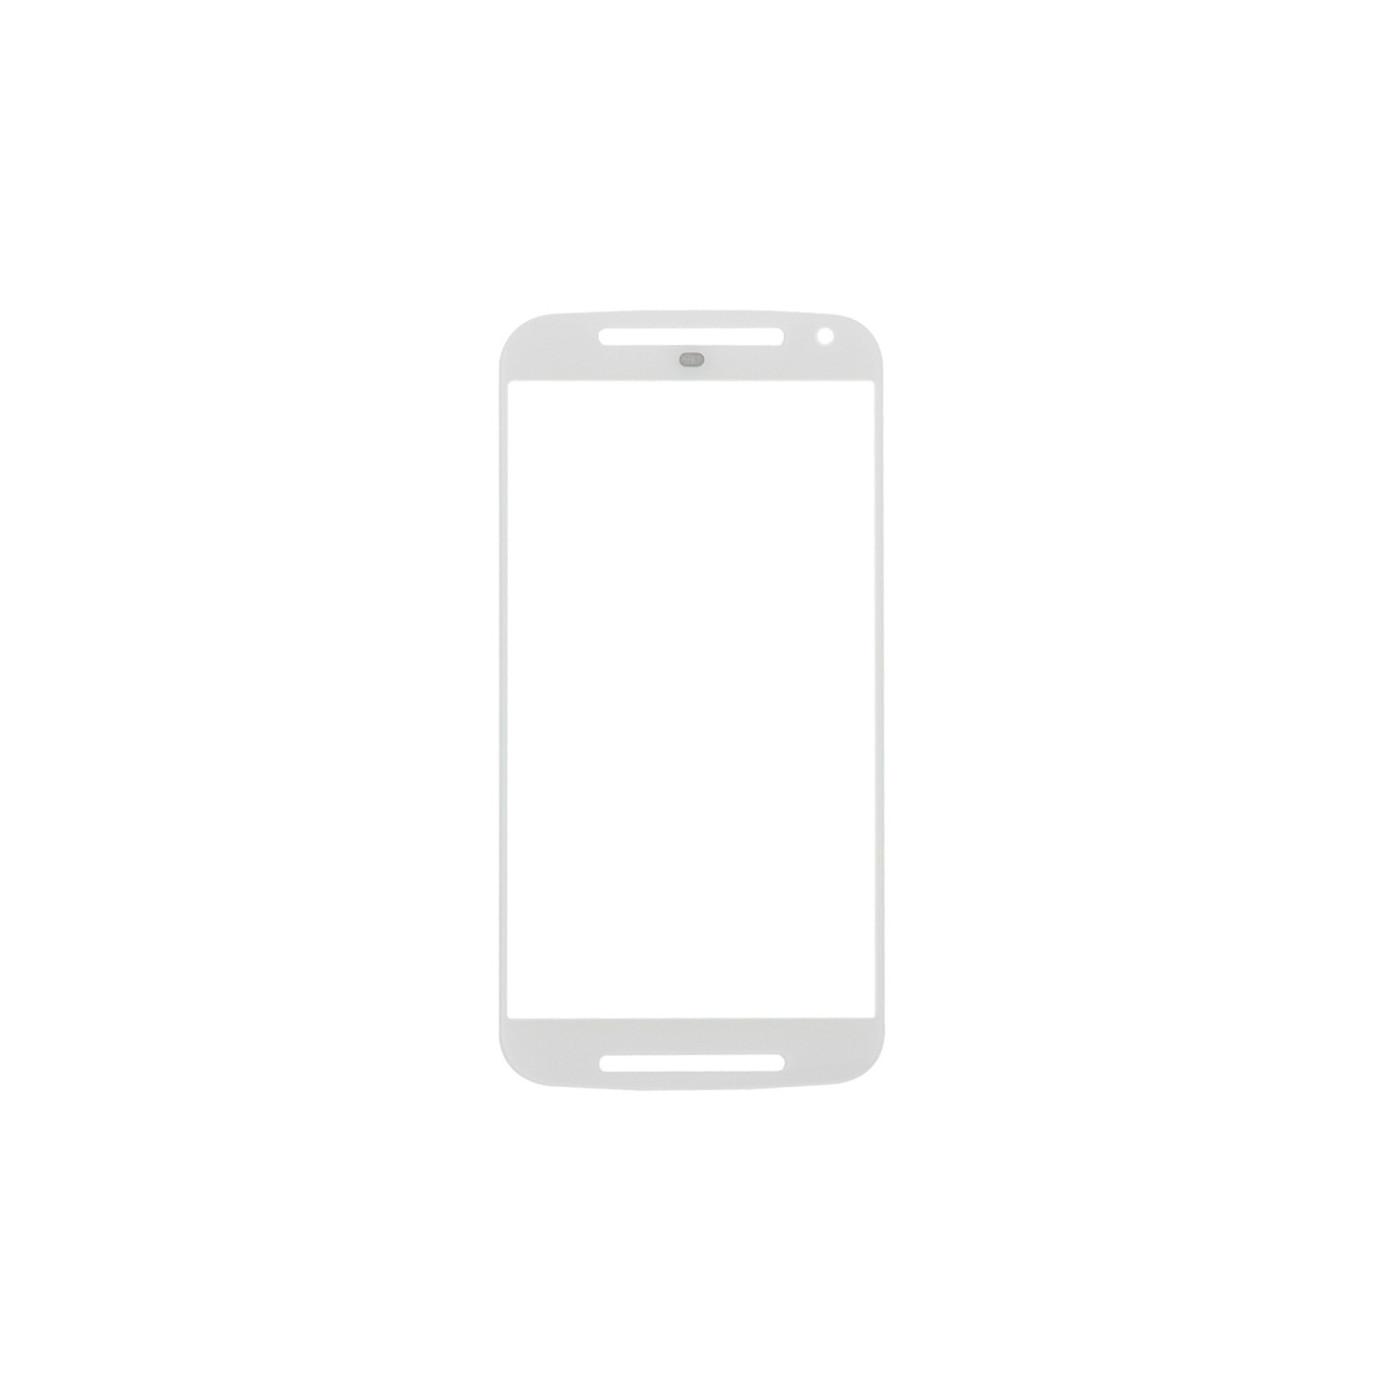 Vetro vetrino Motorola Moto G 2nd Gen XT1063 bianco schermo touch screen